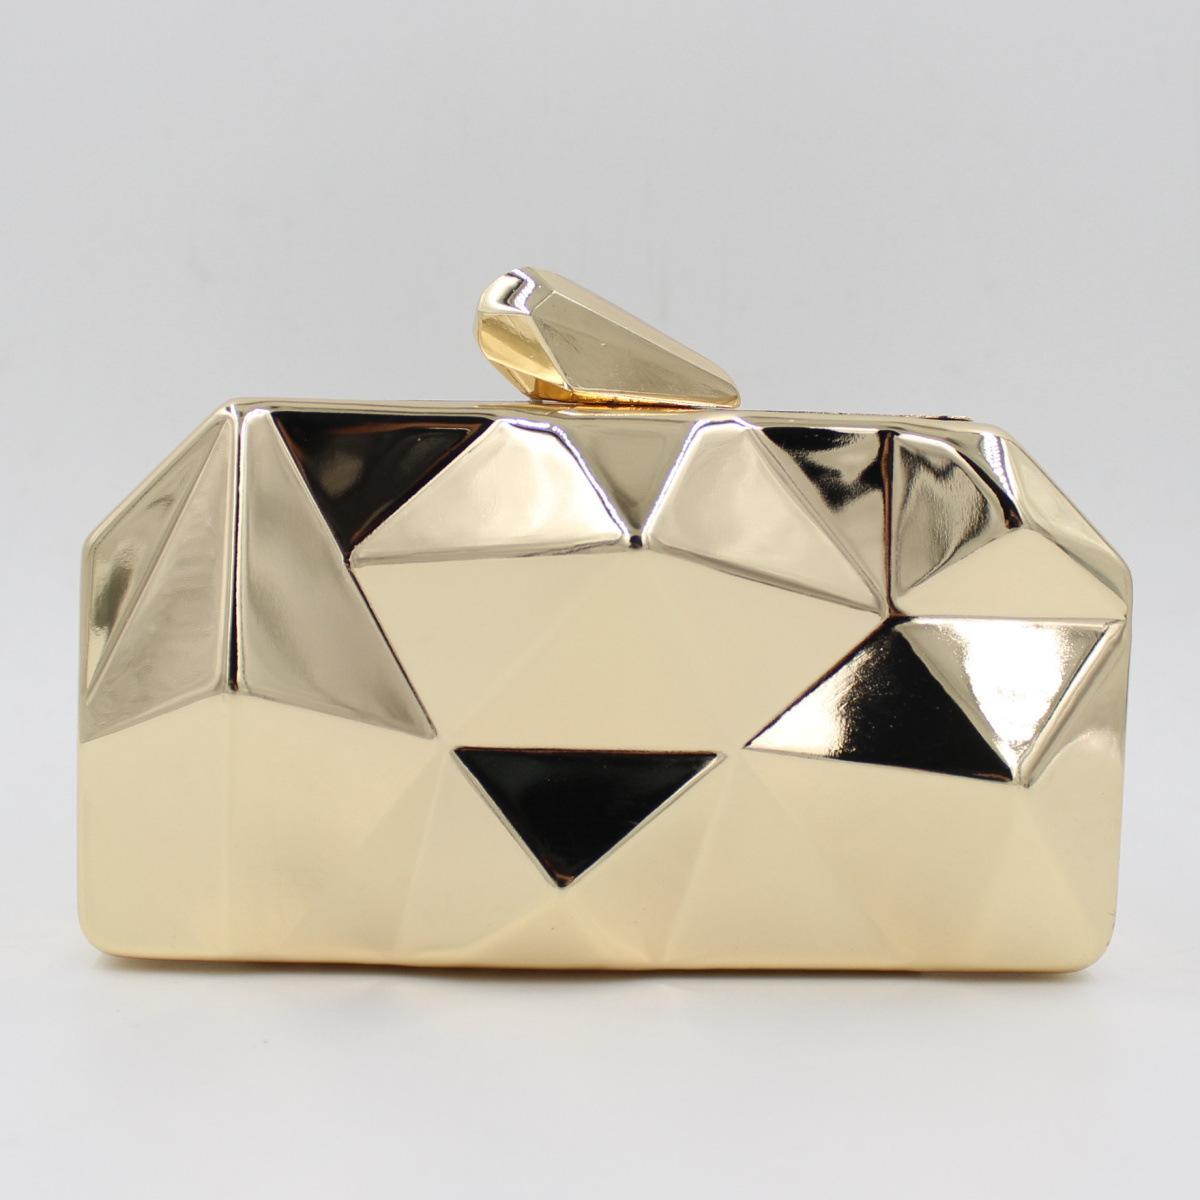 2016 Limited Leather Handbags Bolsa Feminina New European High-grade Diamond Supply Tin Dinner Bag Are Irregular Hand Wholesale(China (Mainland))